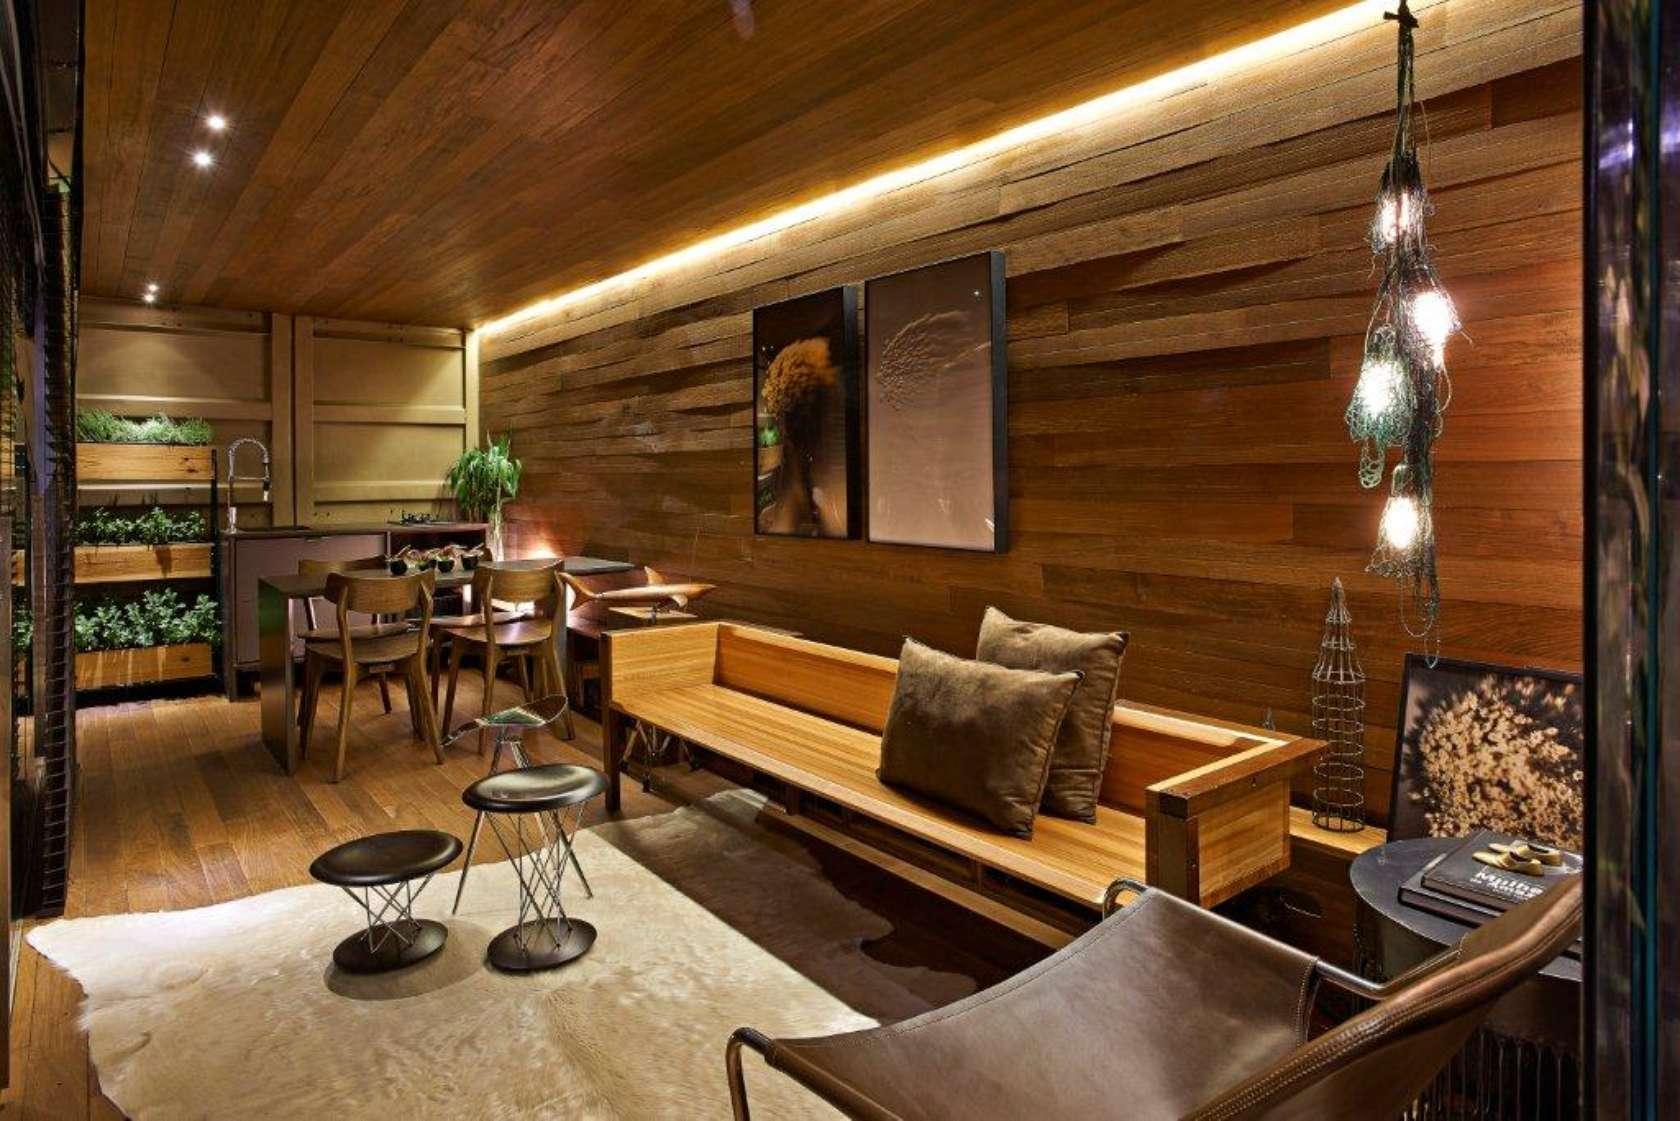 Pocket house architizer - Pared rustica interior ...